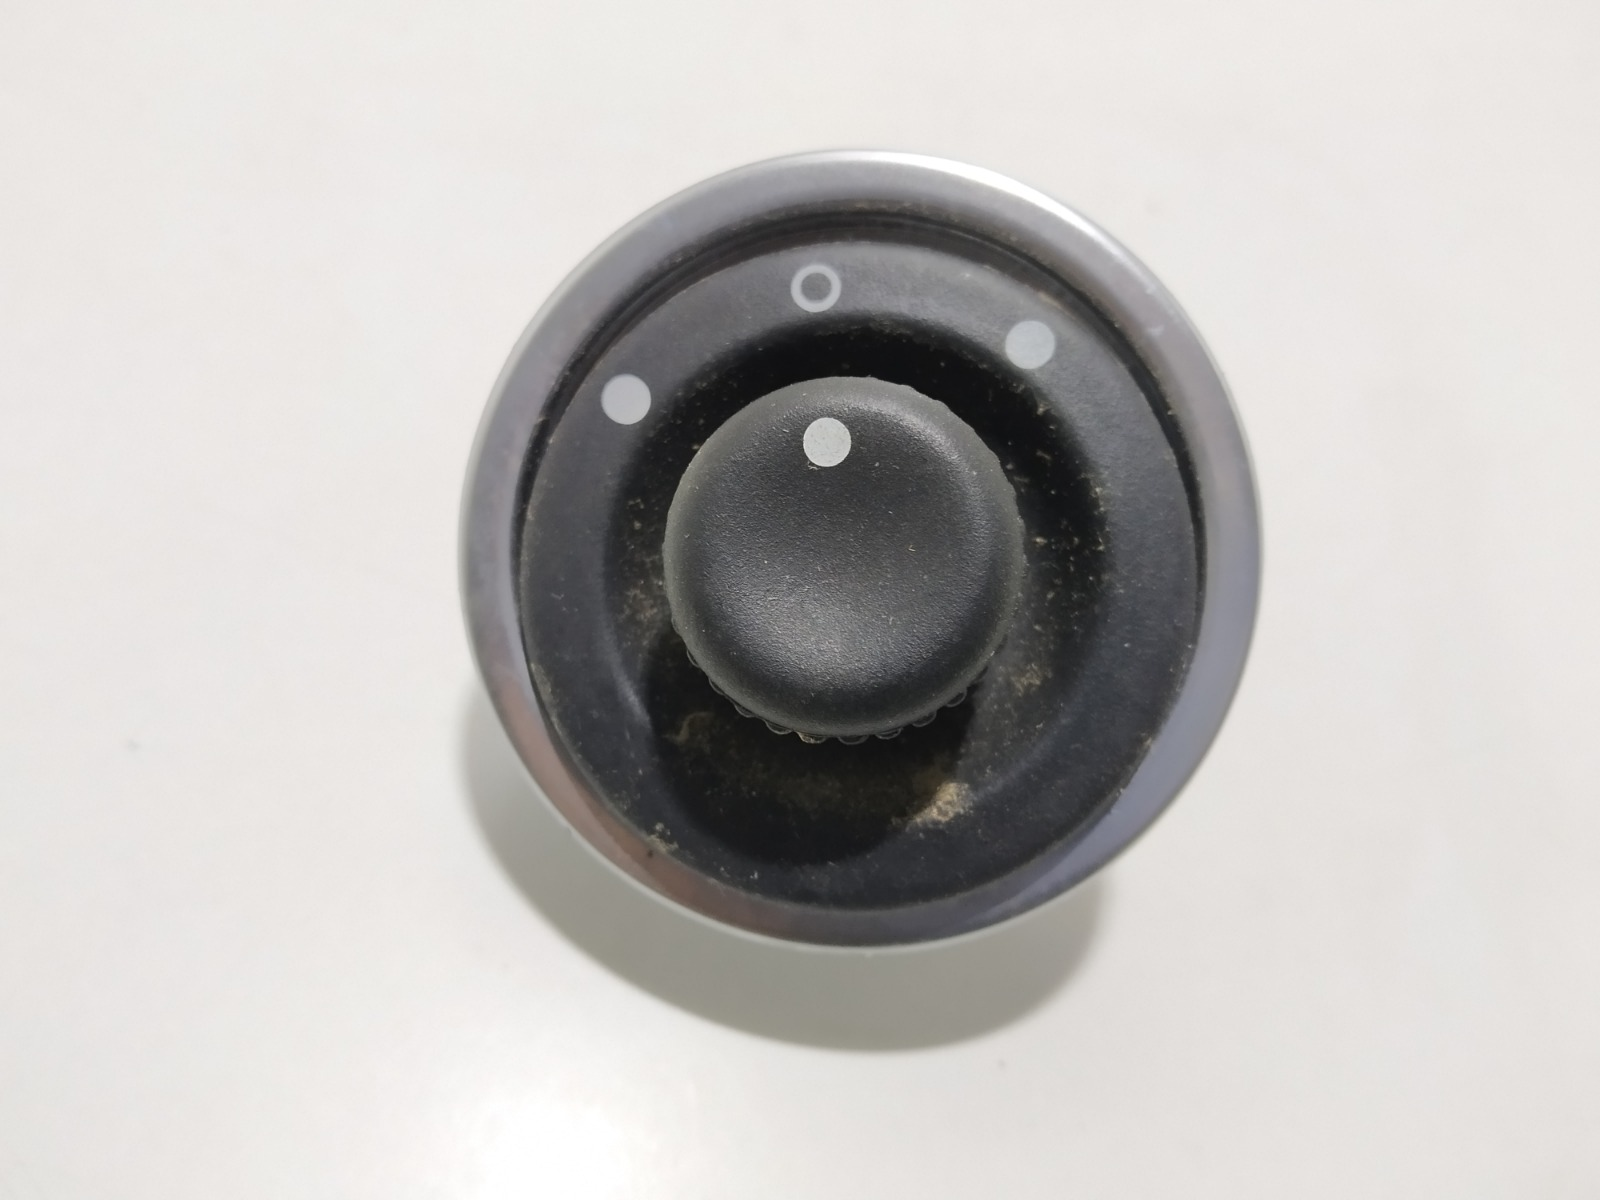 Джойстик регулировки зеркал Renault Laguna 2.0 I 2007 (б/у)